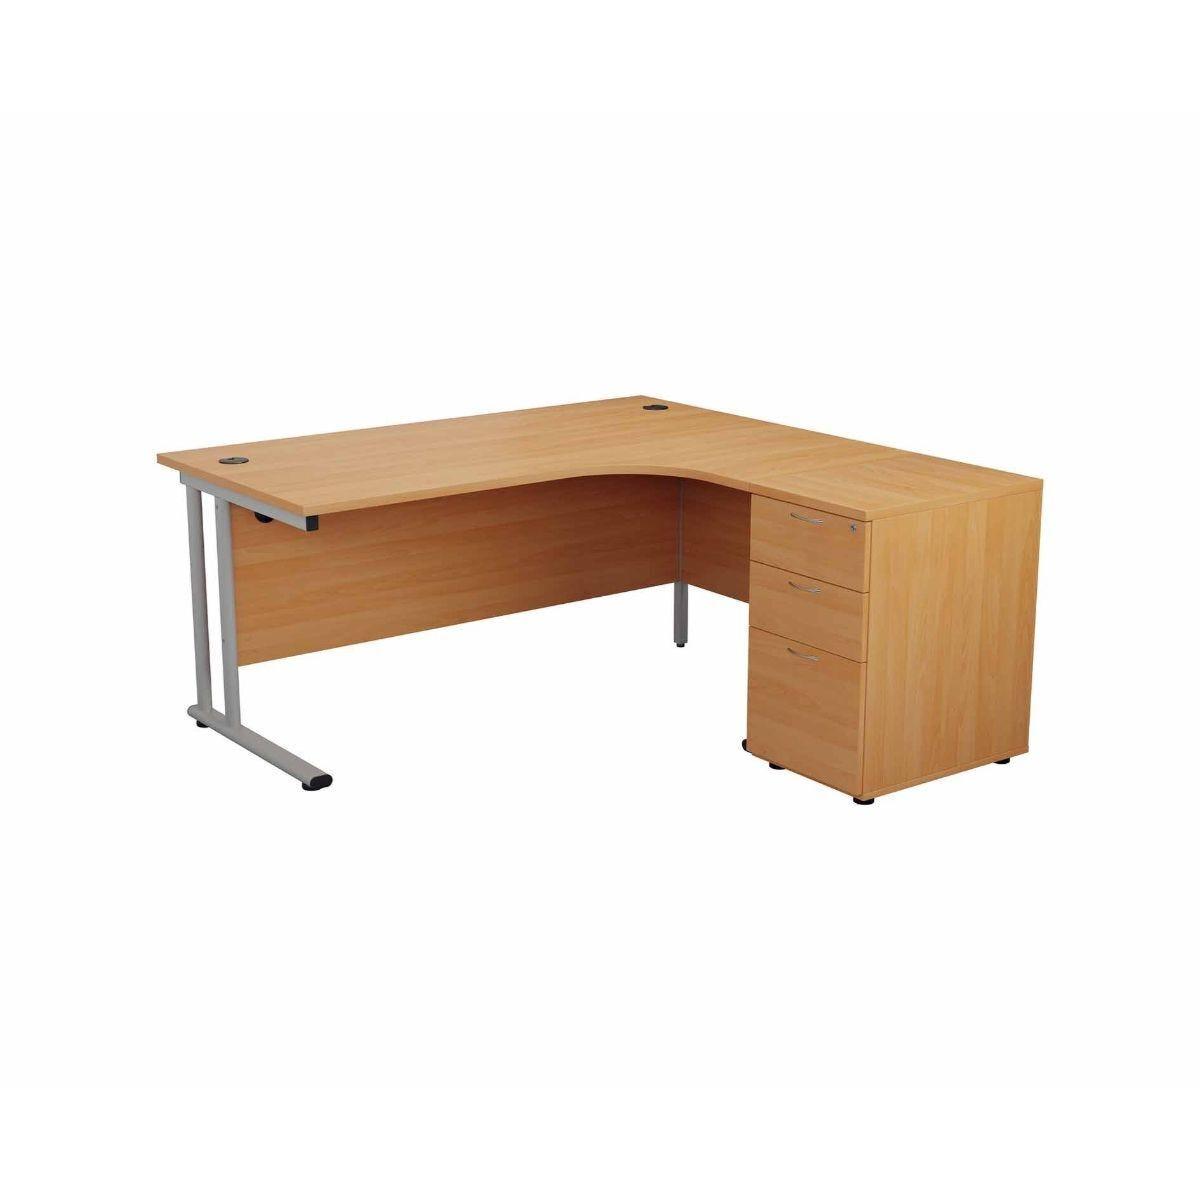 TC Office Start Silver Cantilever Frame Left Hand Crescent Desk with High Pedestal 1800x1200mm